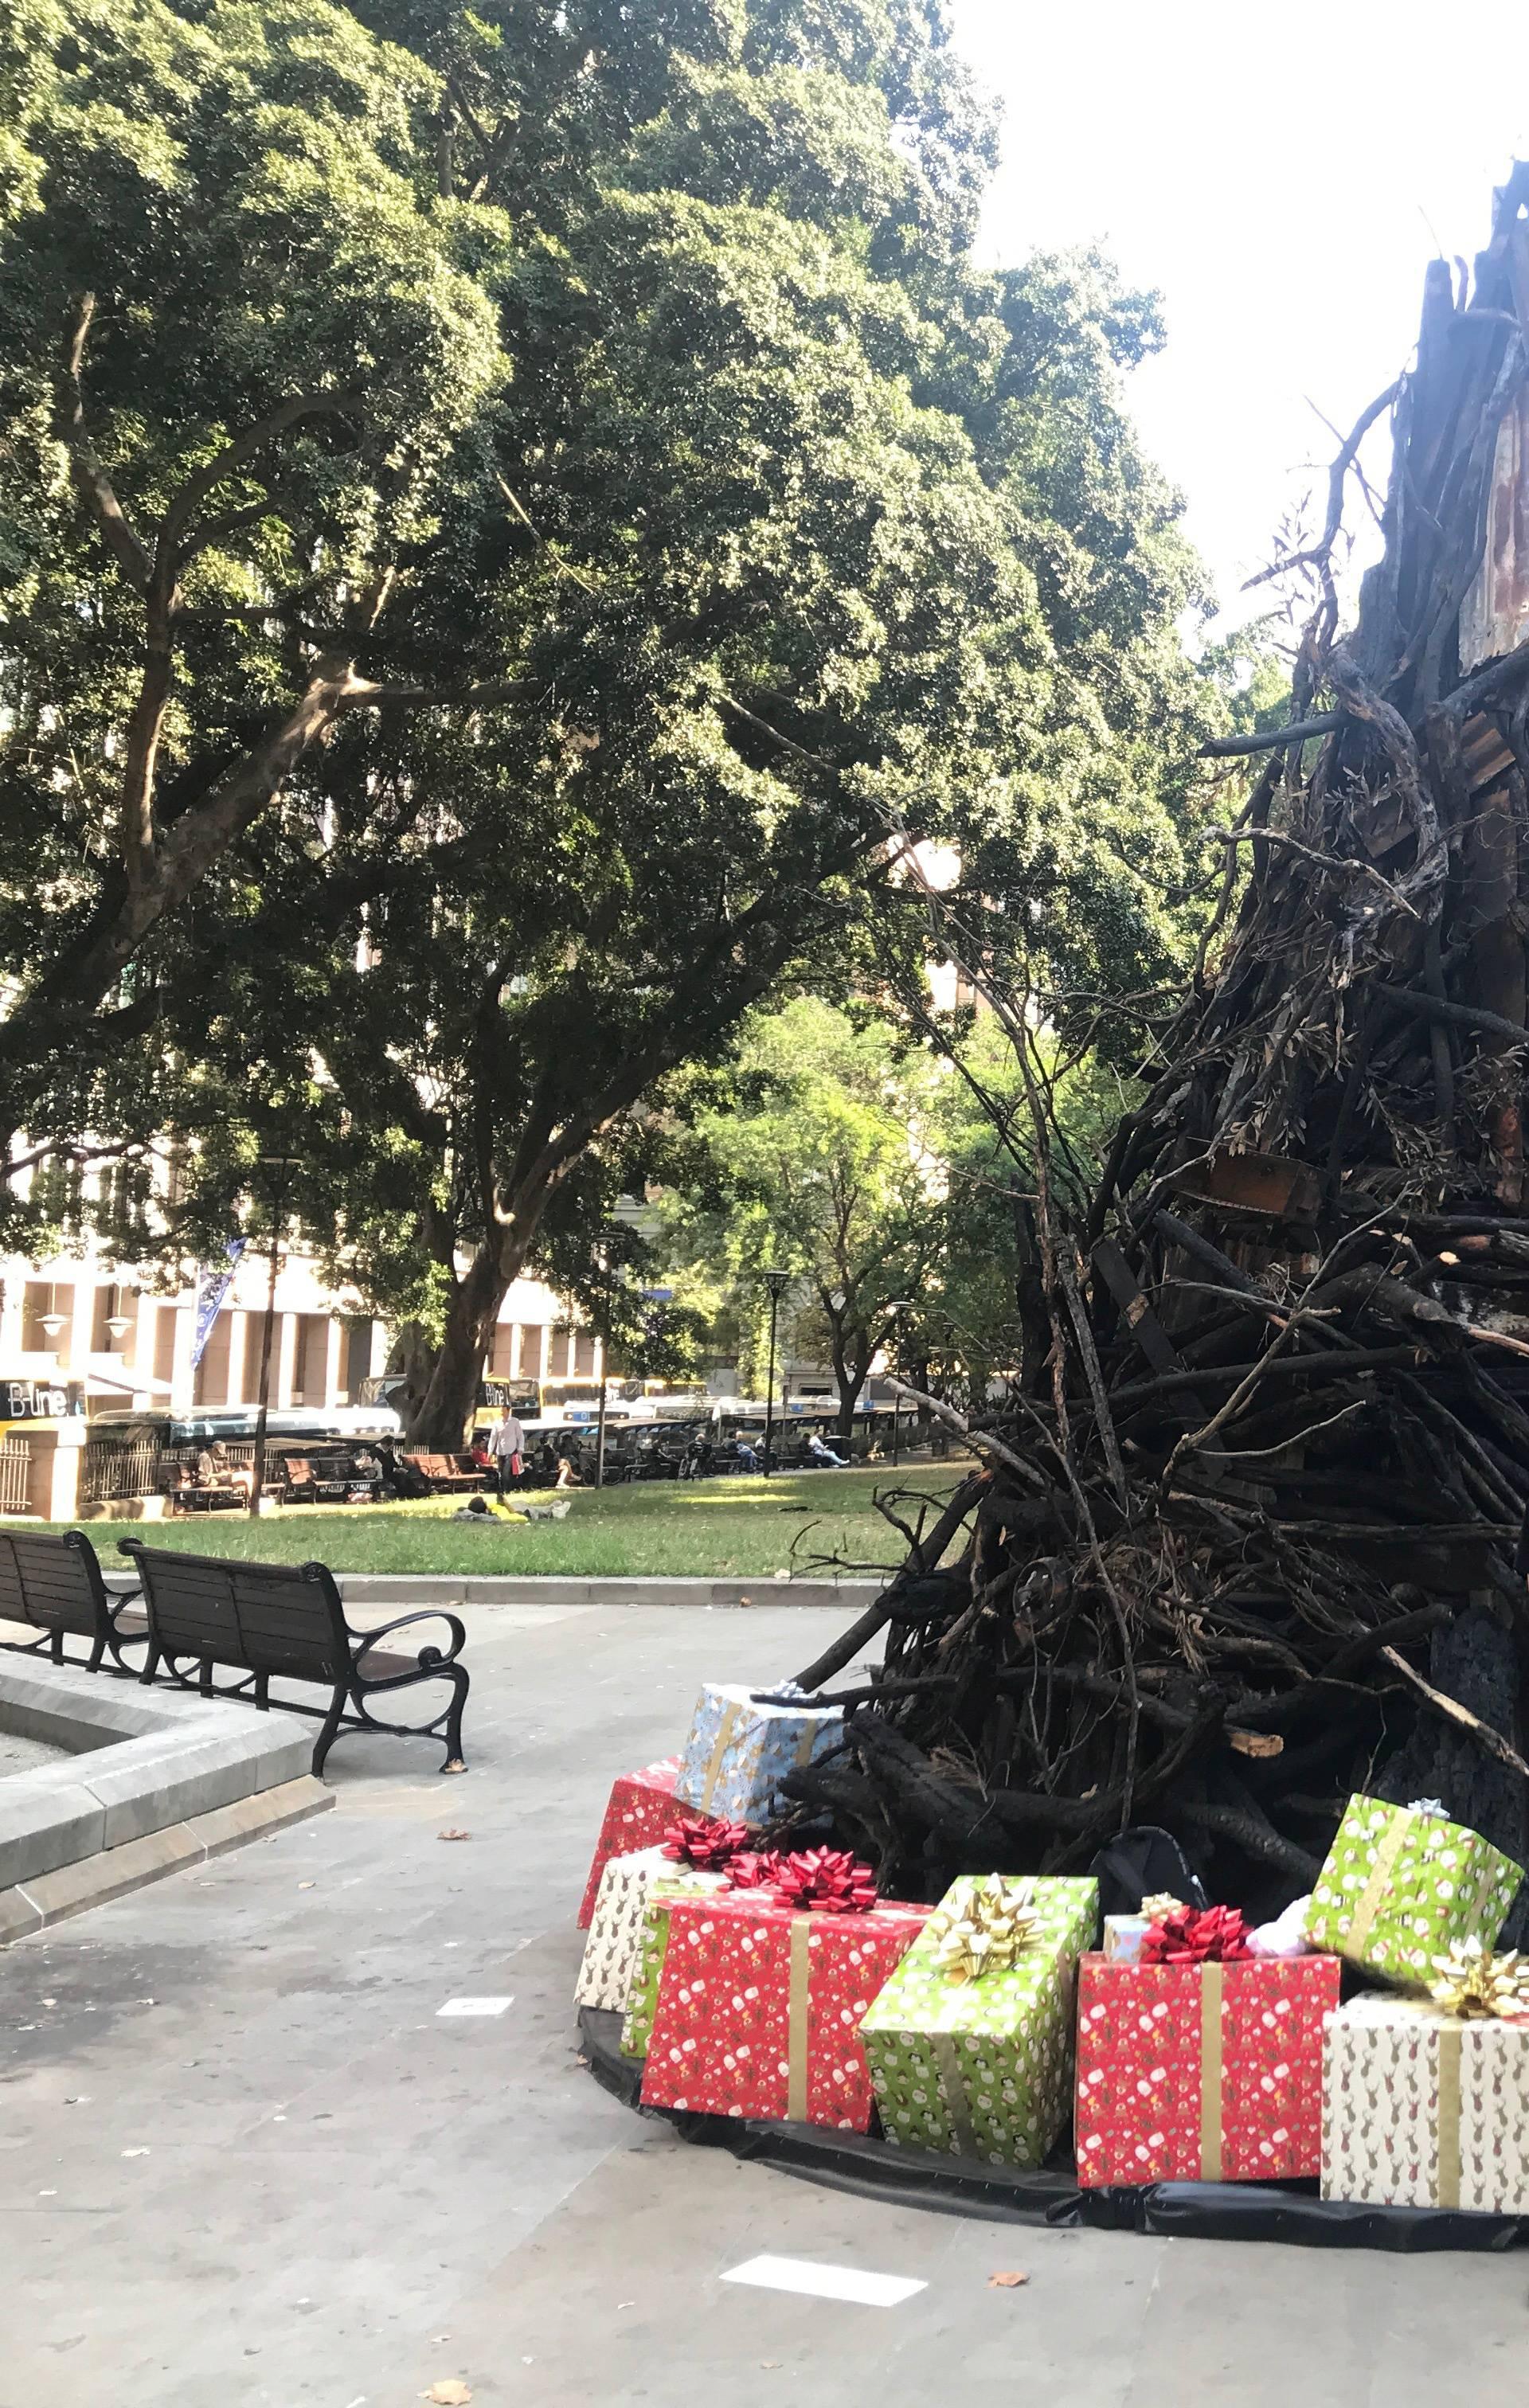 Božićno drvce od ostataka požara kao simbol katastrofe